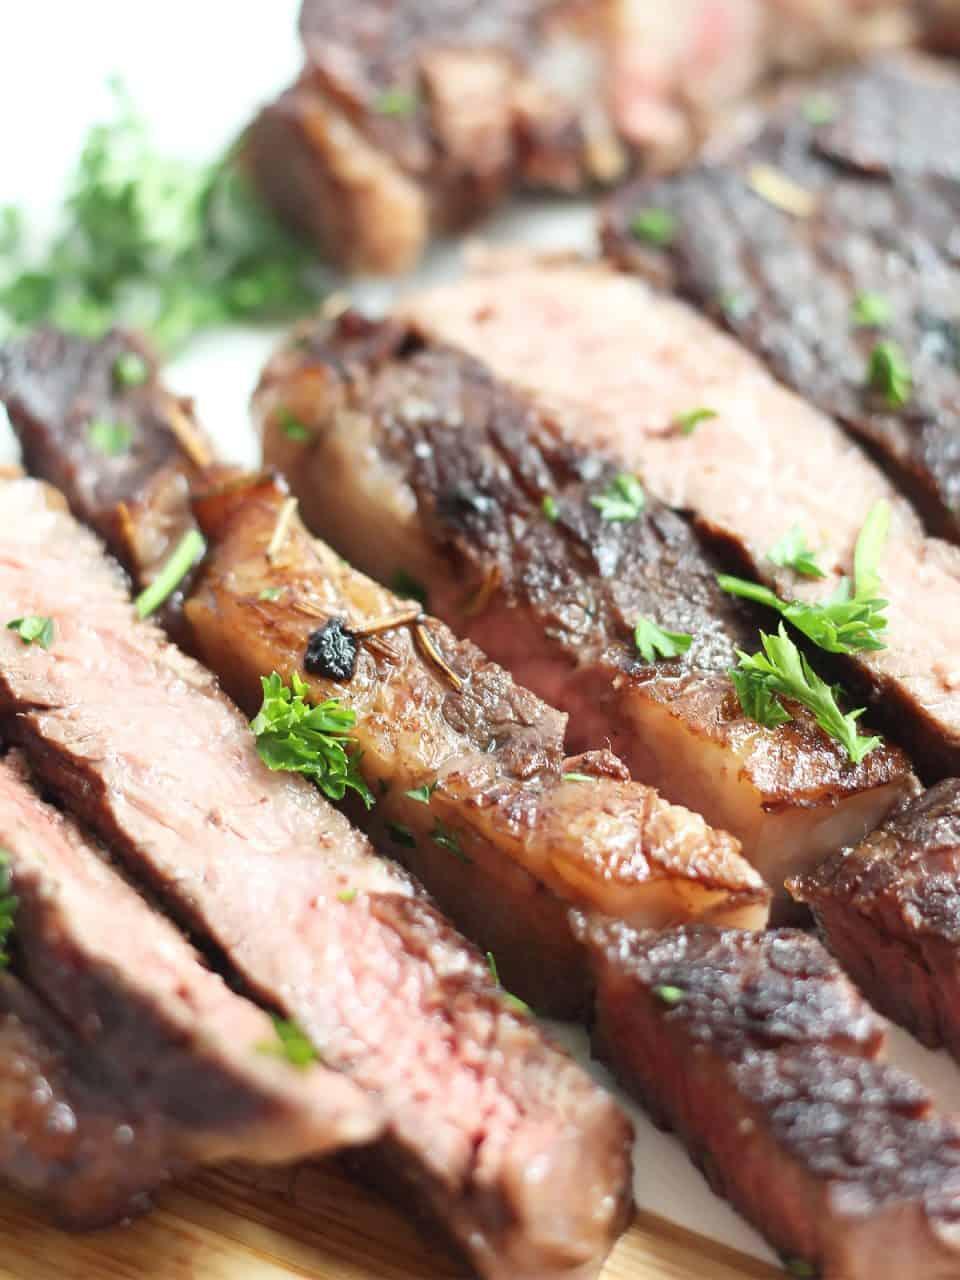 Fresh parsley sprinkled over slices of red wine marinated steak.